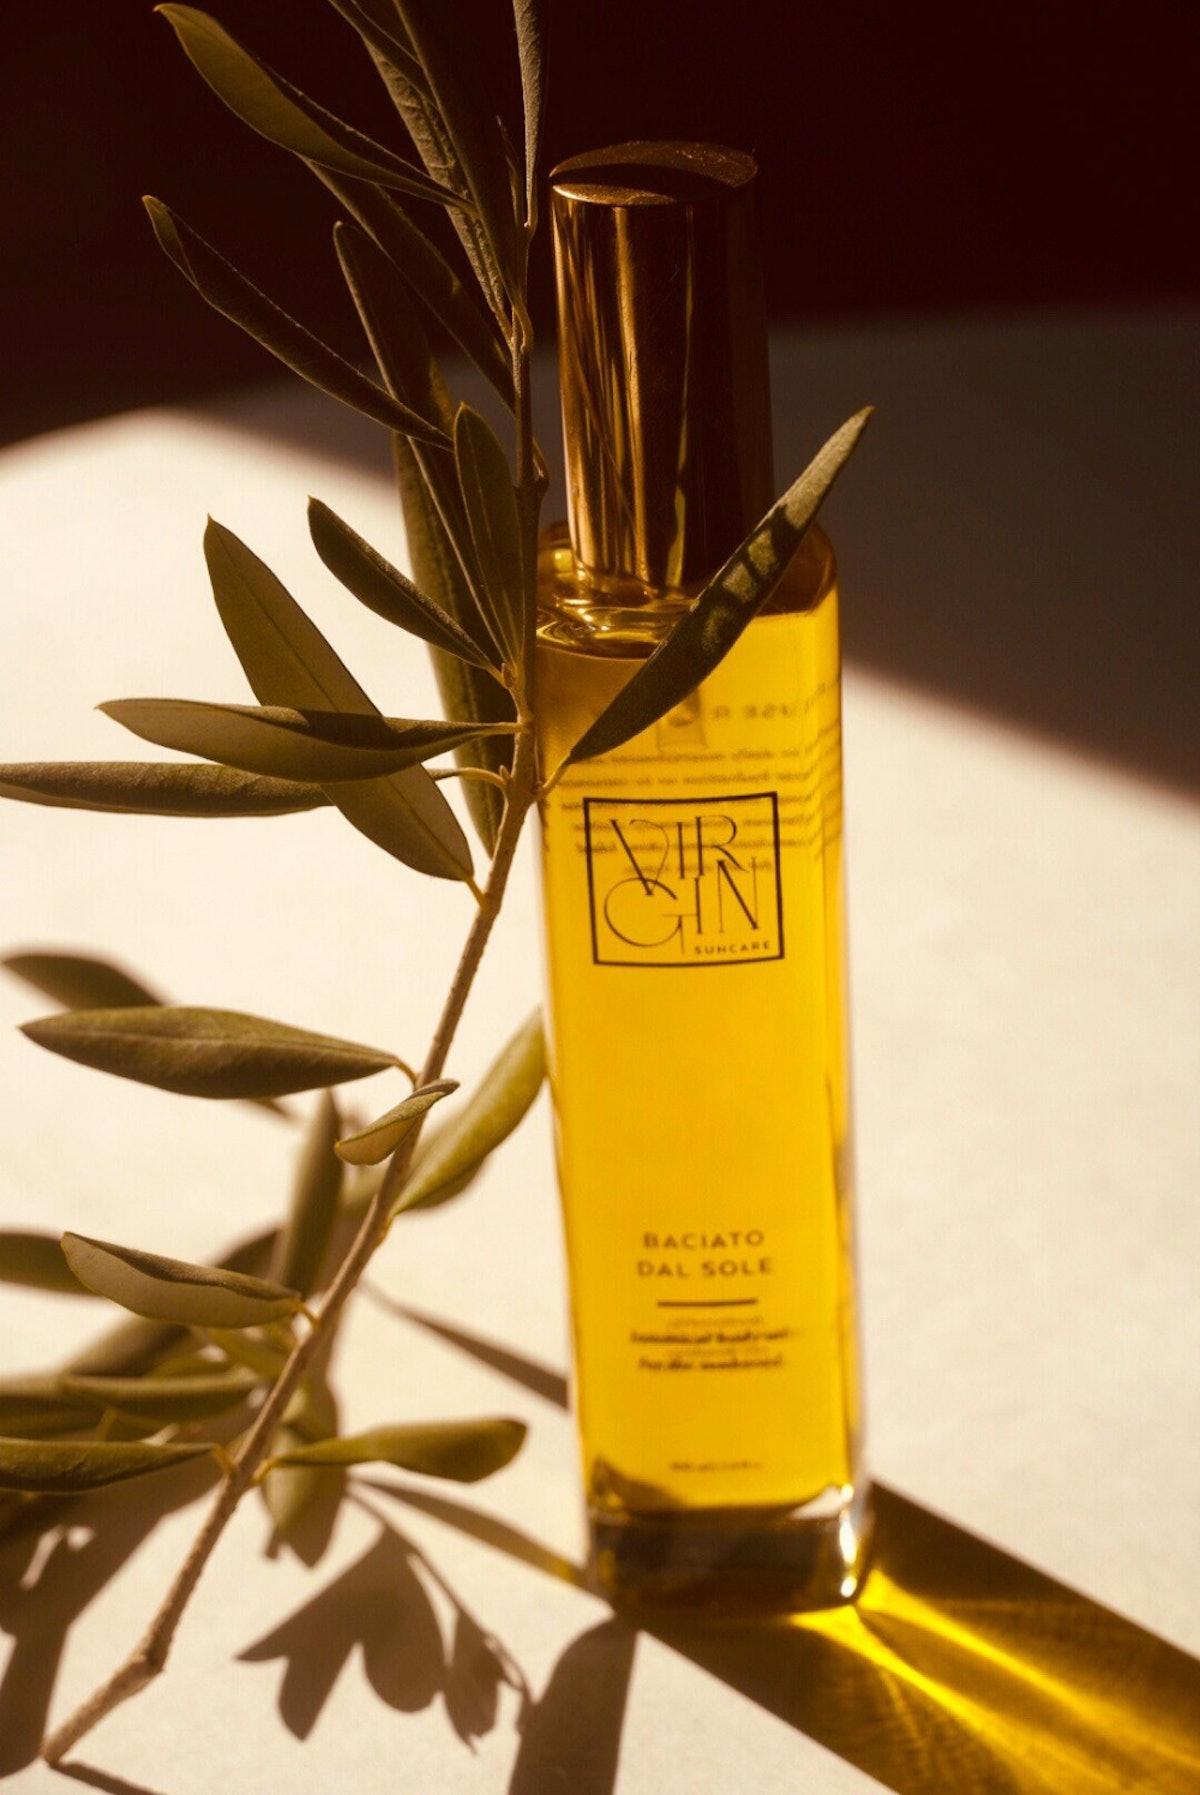 Baciato Dal Sole Botanical Body Oil